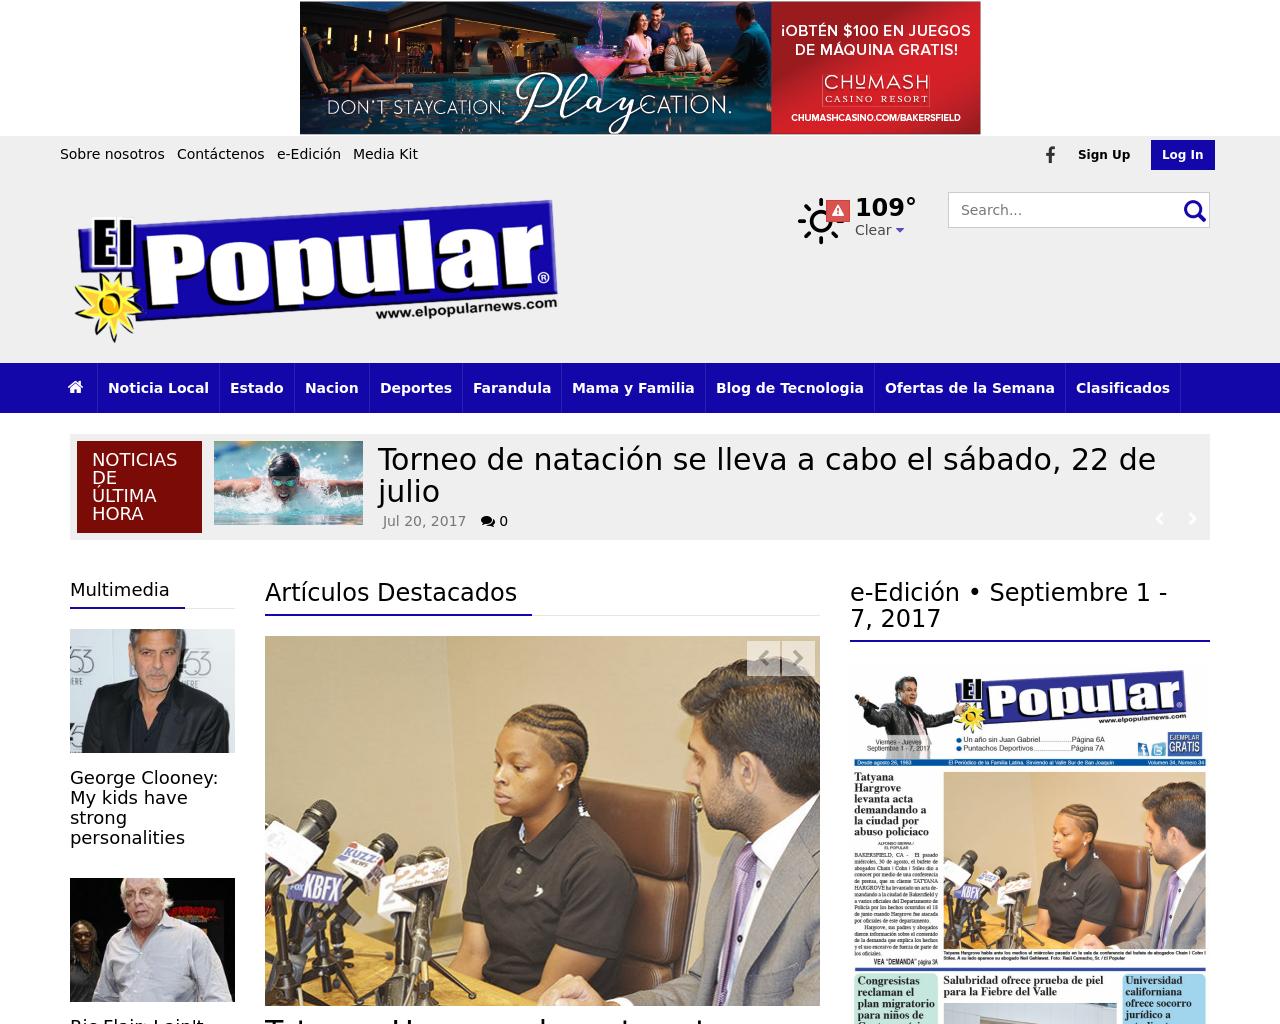 El-Popular-News-Advertising-Reviews-Pricing